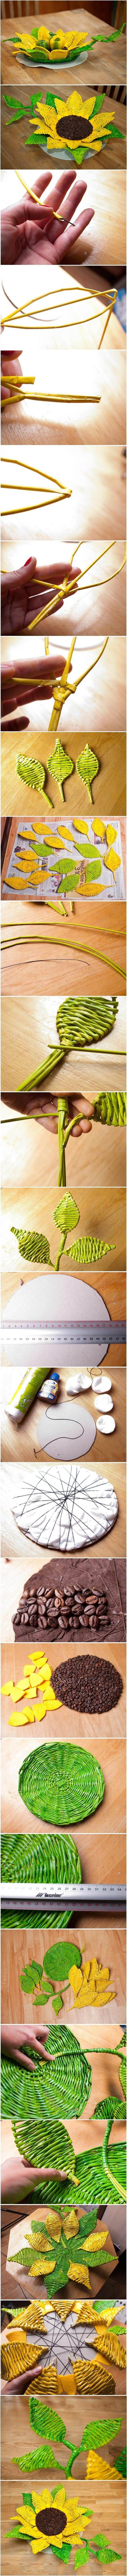 DIY Paper Woven Sunflower Tray | iCreativeIdeas.com Like Us on Facebook ==> https://www.facebook.com/icreativeideas